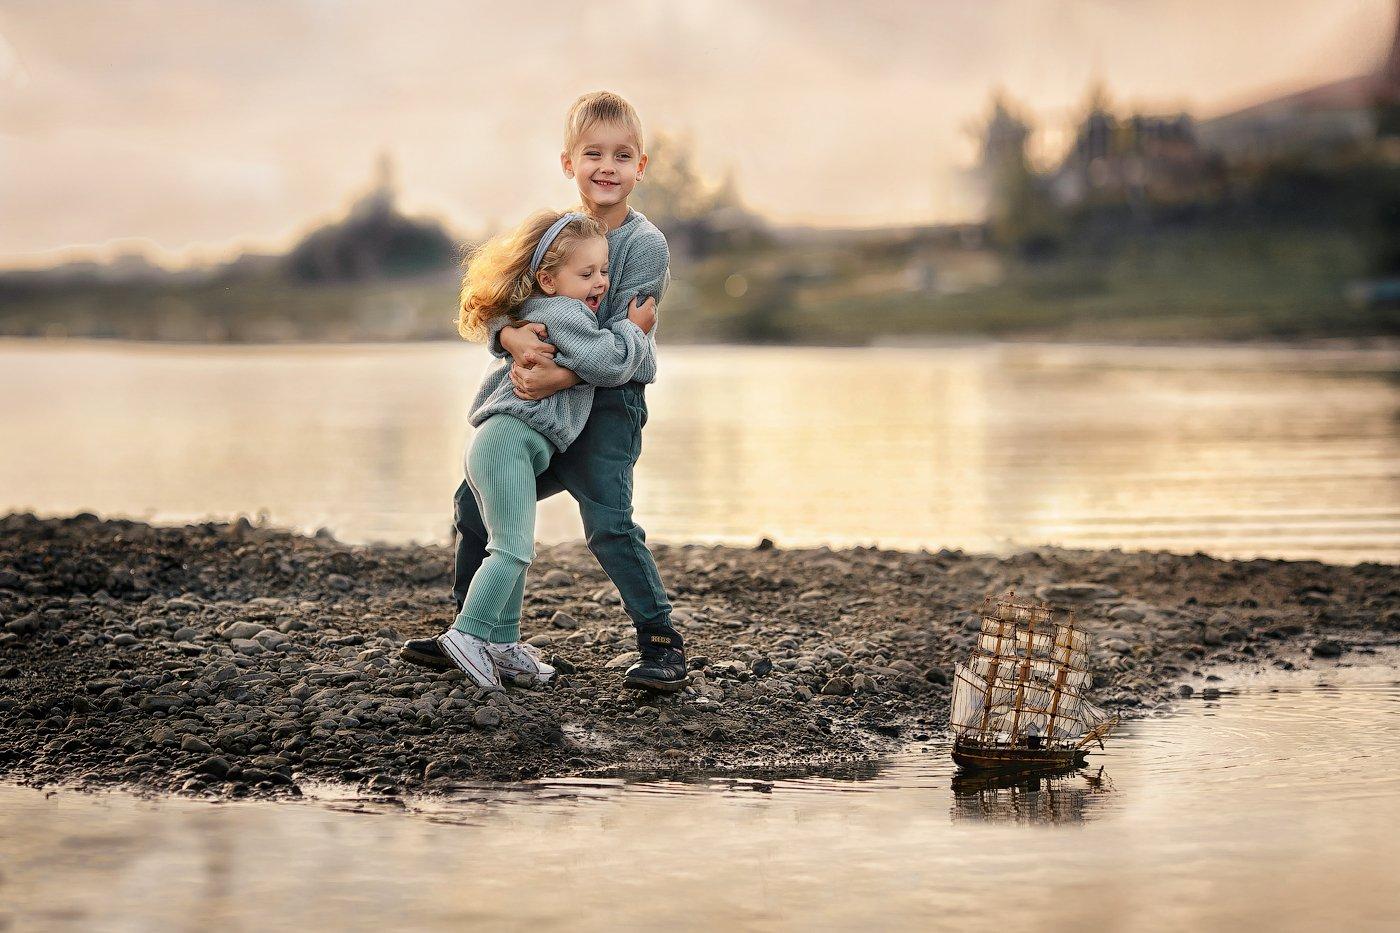 #yuliadin_foto #юлиядин #кемерово #фотографтомск #best_foto_tomsk #семейныйфотограф #дети #детскийфотограф #photos #photograph #томск #135mm #best_foto_russia #kids #photochallenge #photo #instamama #mams #35photo, Юлия Дин